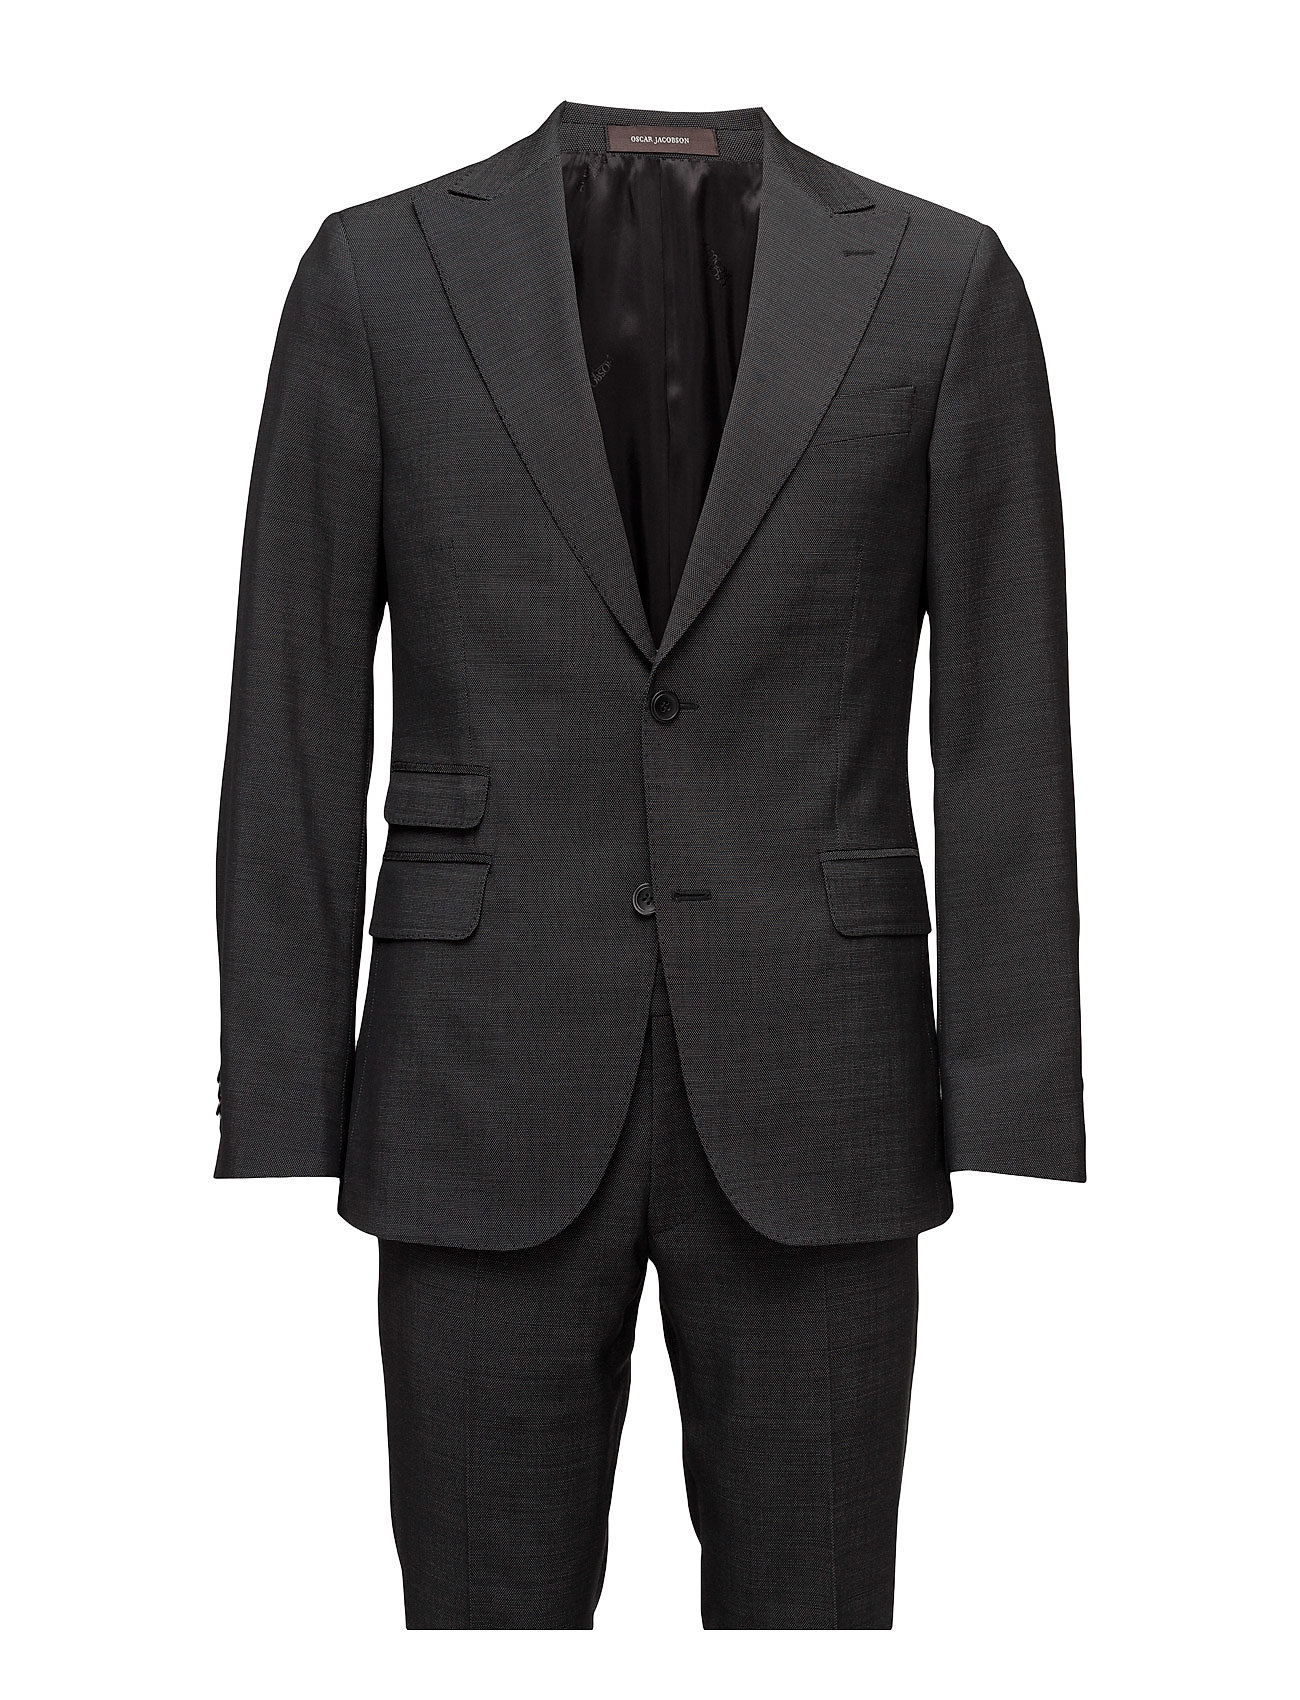 Elmer Suit Oscar Jacobson Suits & Blazers thumbnail